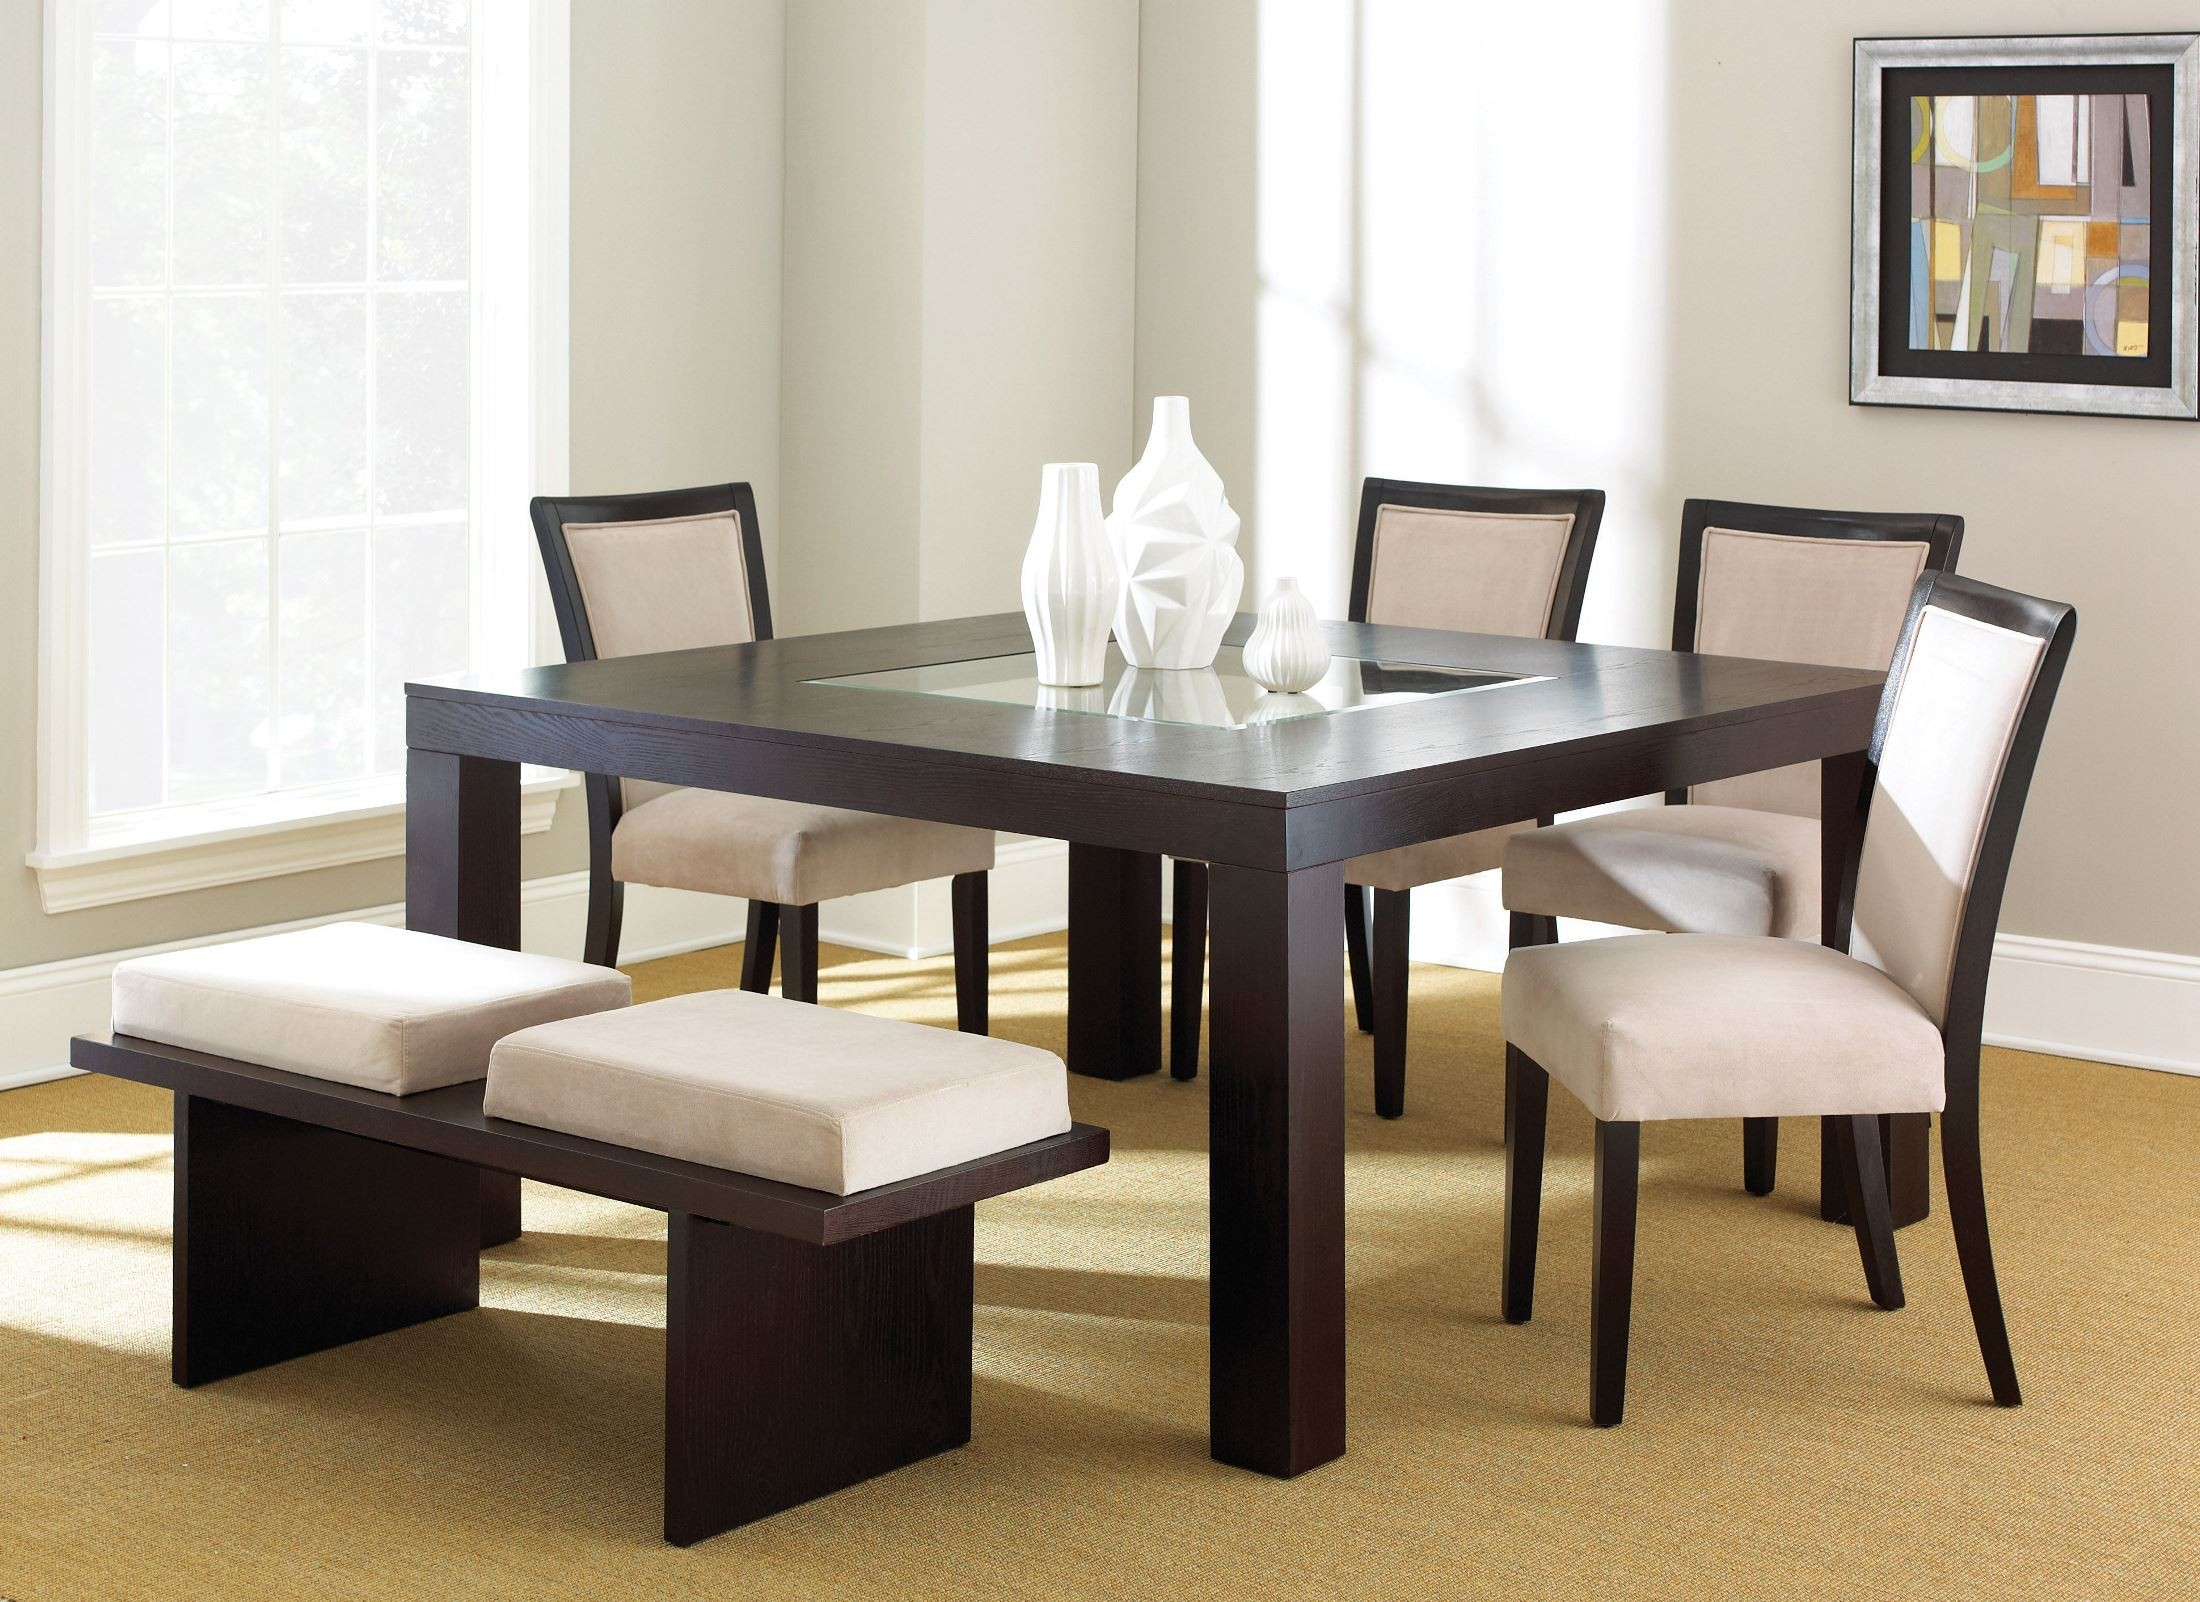 movado espresso cherry dining room set from steve silver mv200t